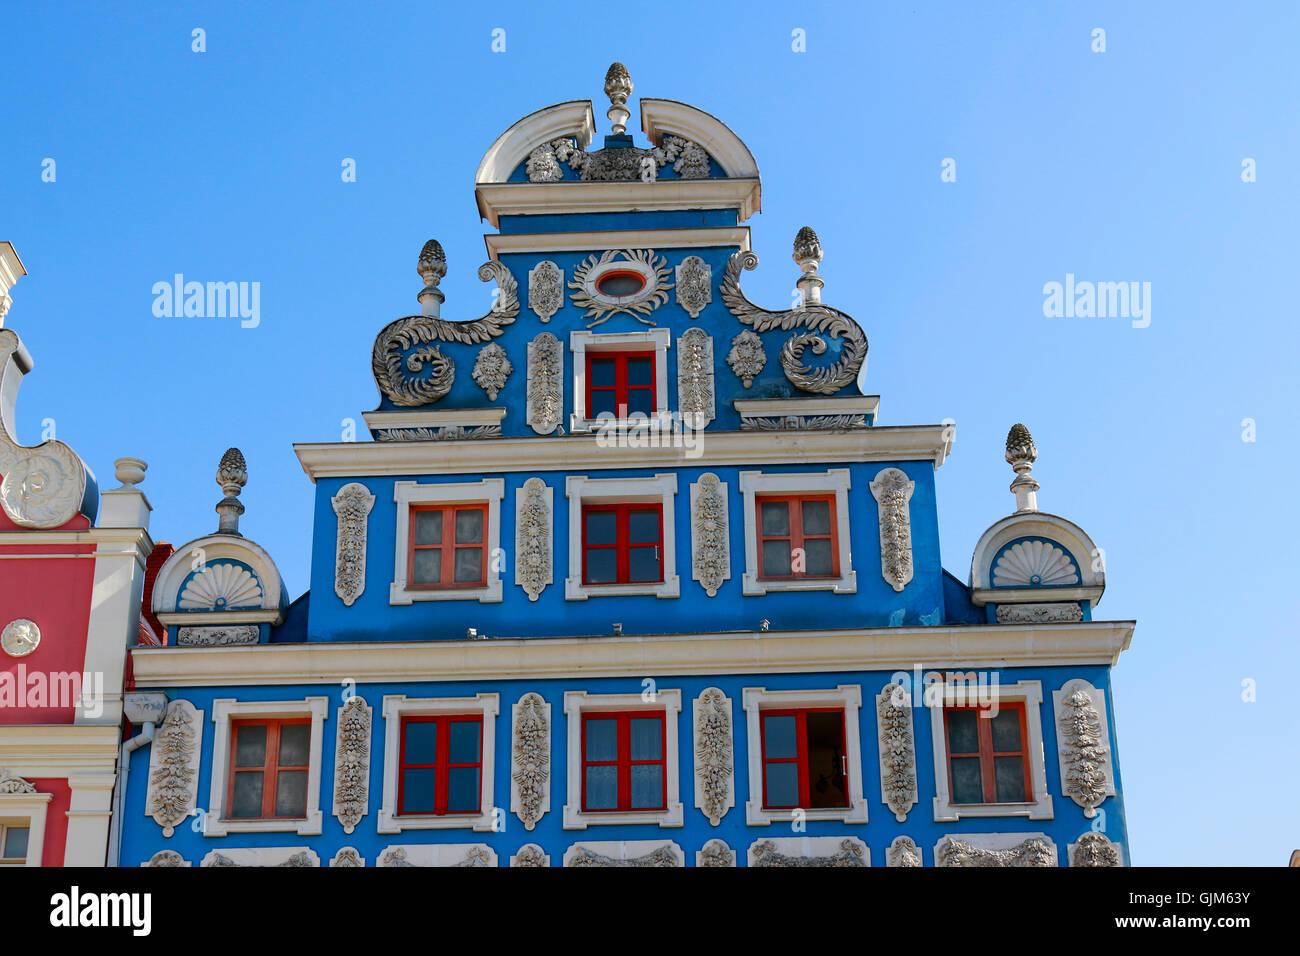 Impressionen: Heumarkt, Altstadt - Stettin, Polen. Stockbild